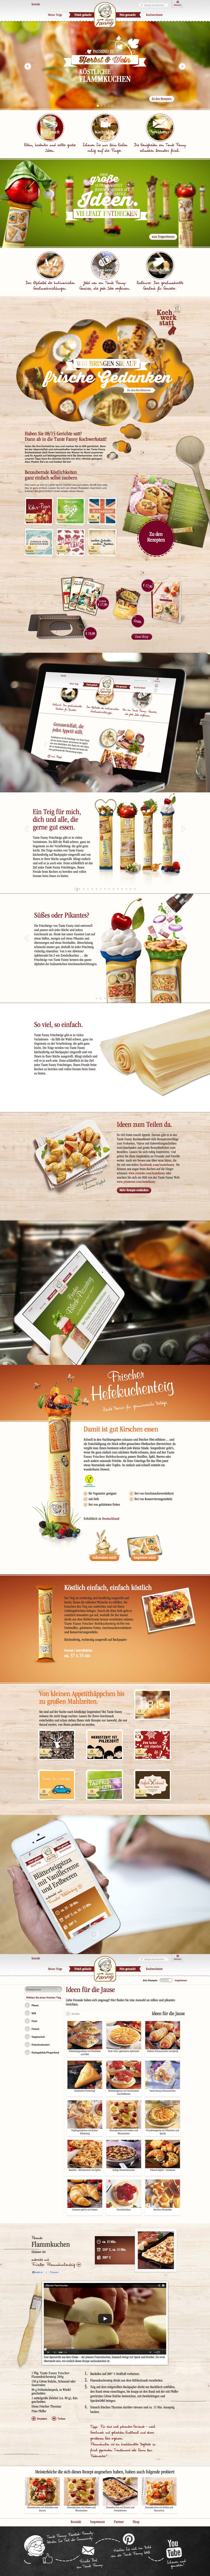 www.tantefanny.at  Repinned by www.lunik2.com #branding #webdesign #design…